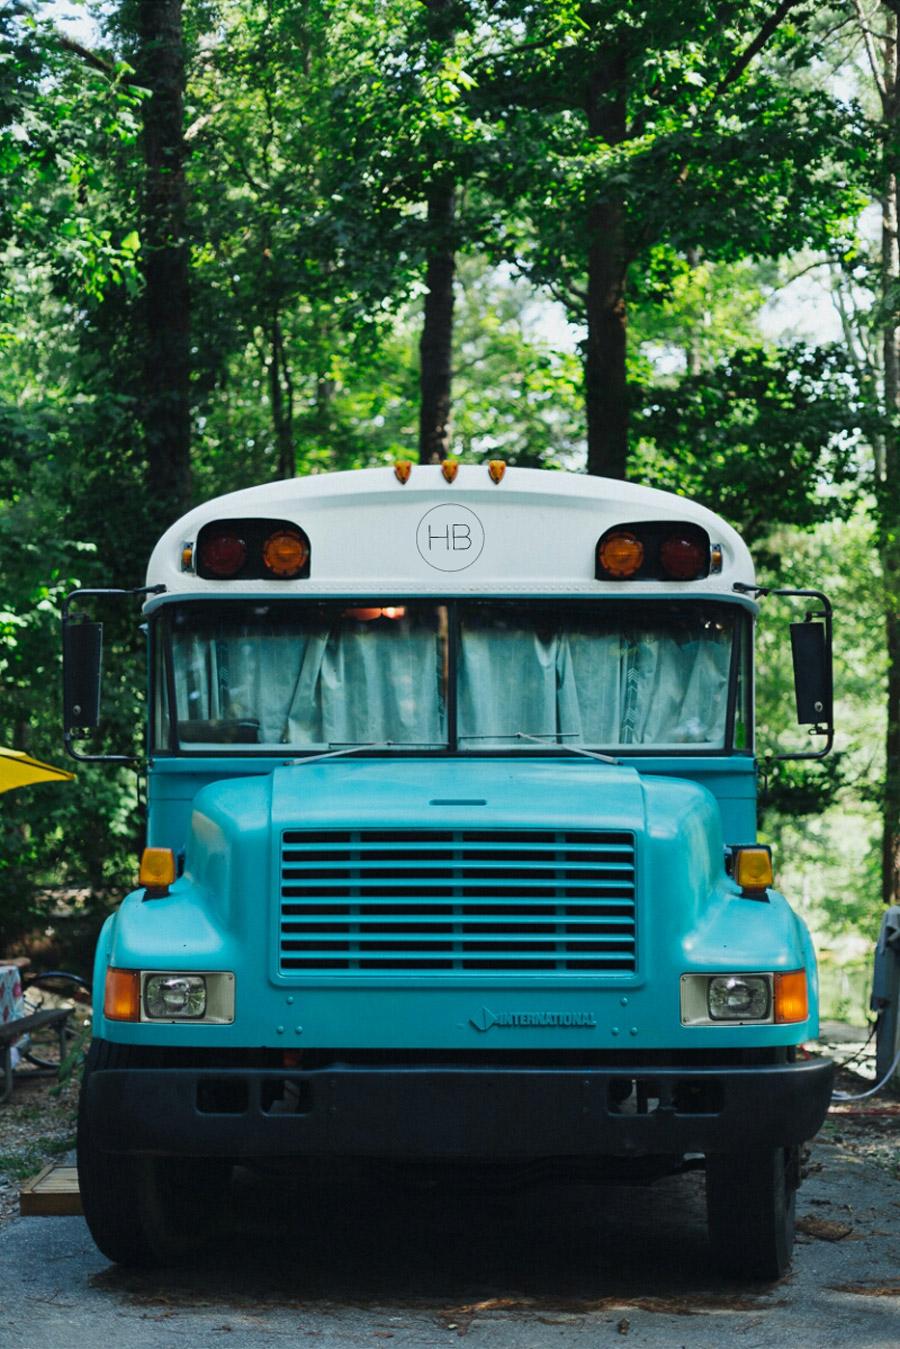 house-bus-1